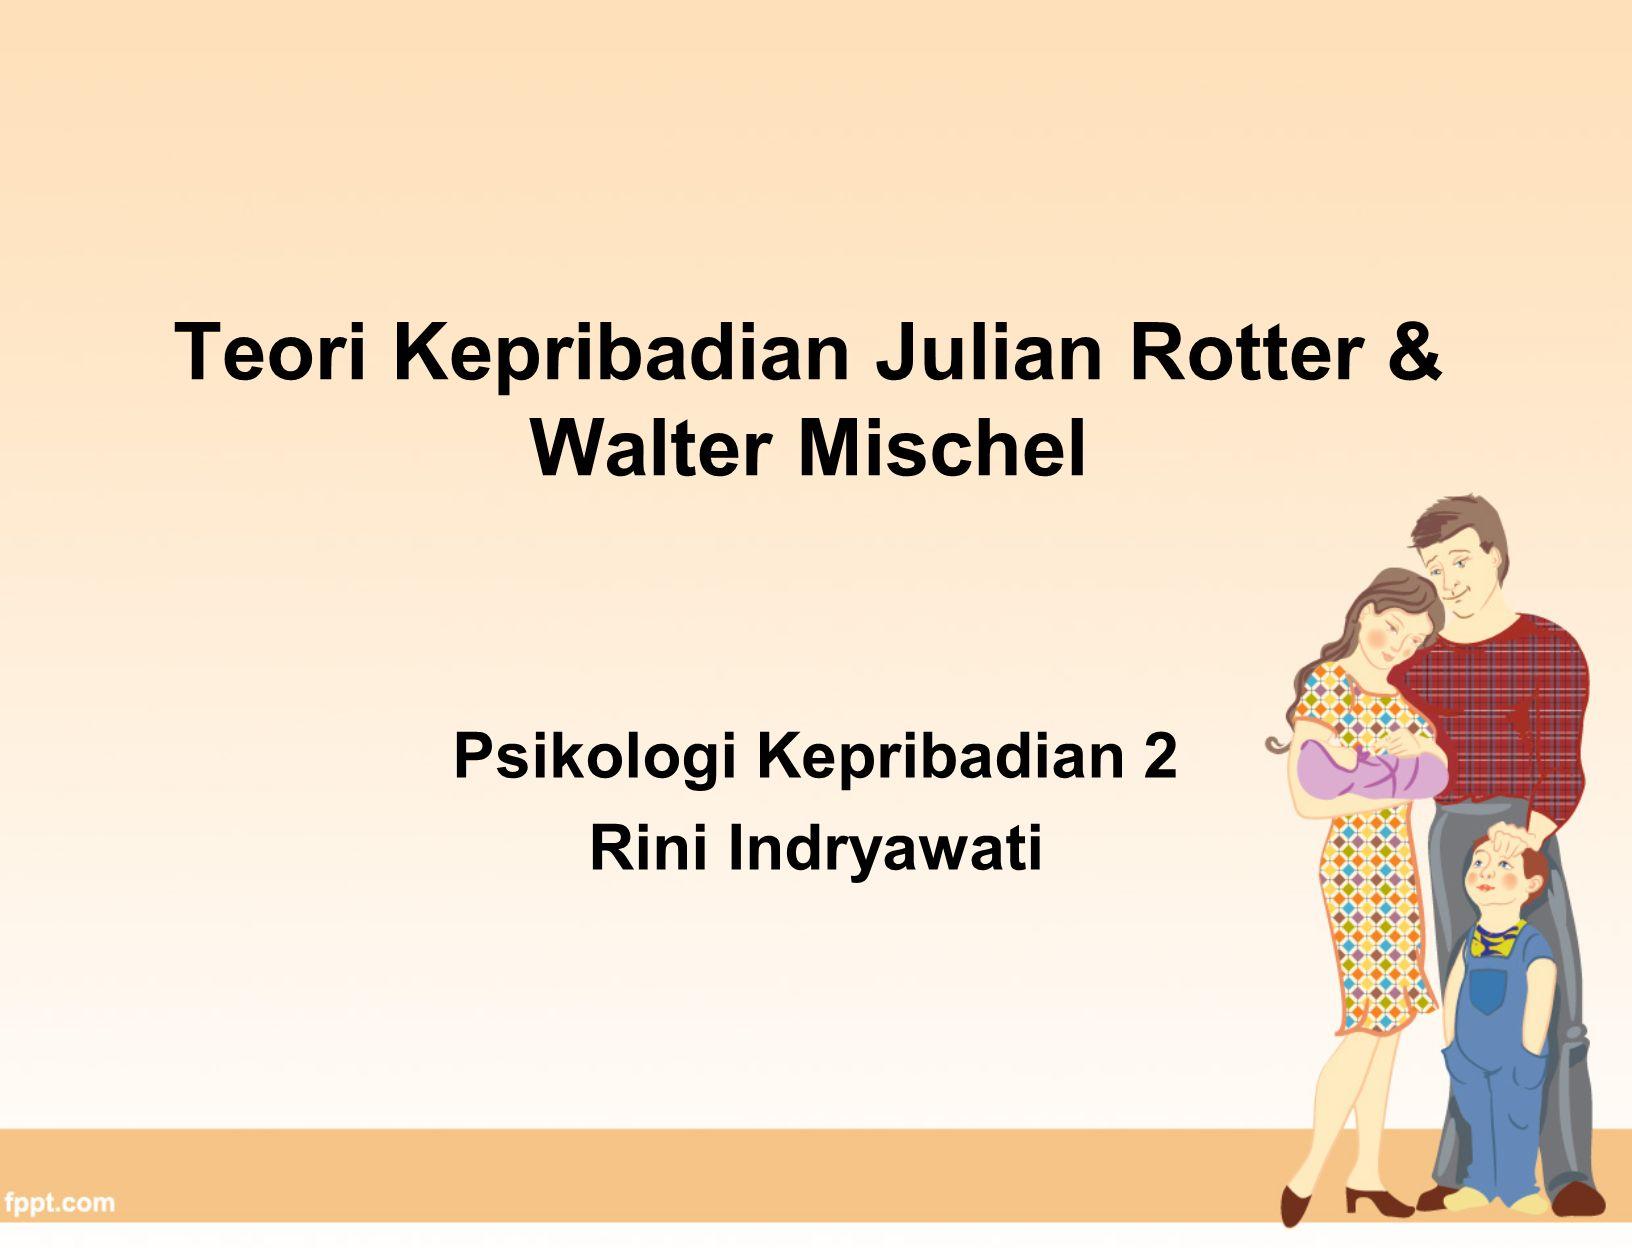 Teori Kepribadian Julian Rotter & Walter Mischel Psikologi Kepribadian 2 Rini Indryawati